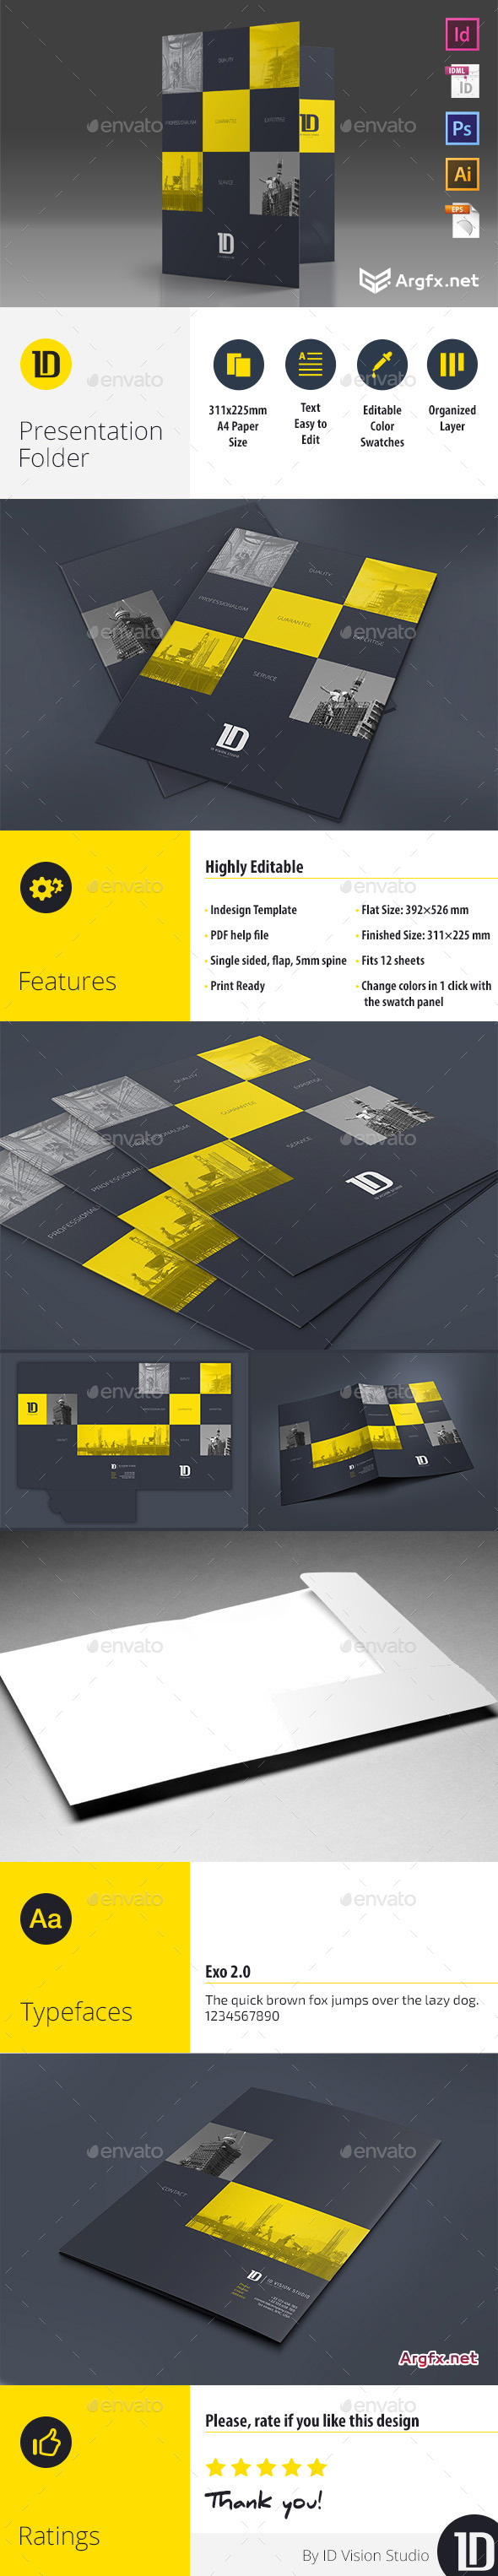 A4 Self Locking Multipurpose Presentation Folder 002 10497712